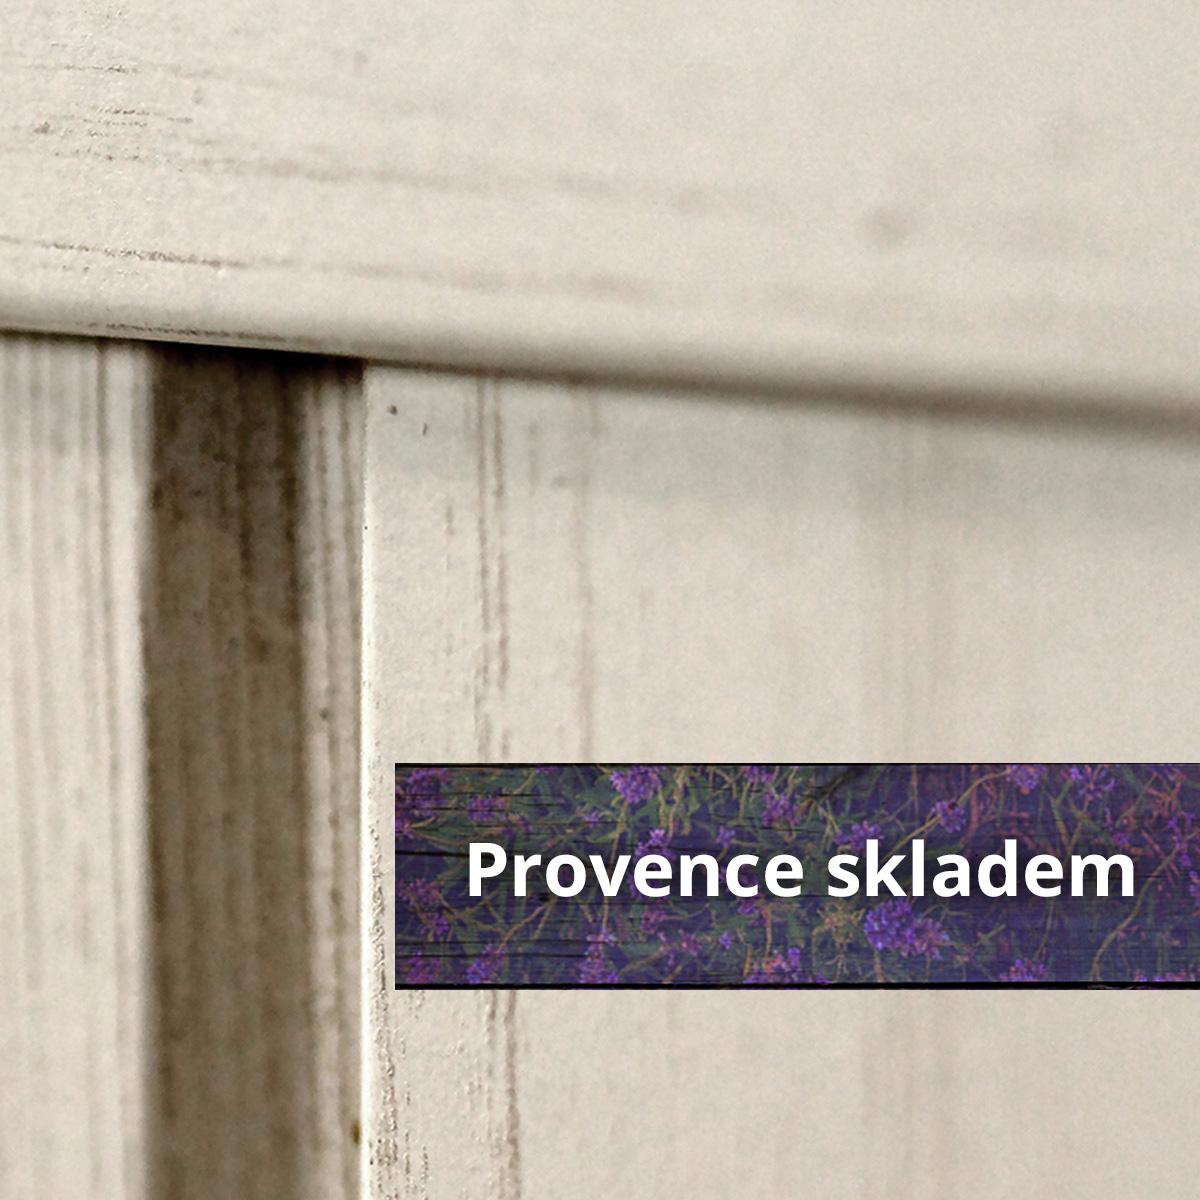 Nábytek Provence skladem